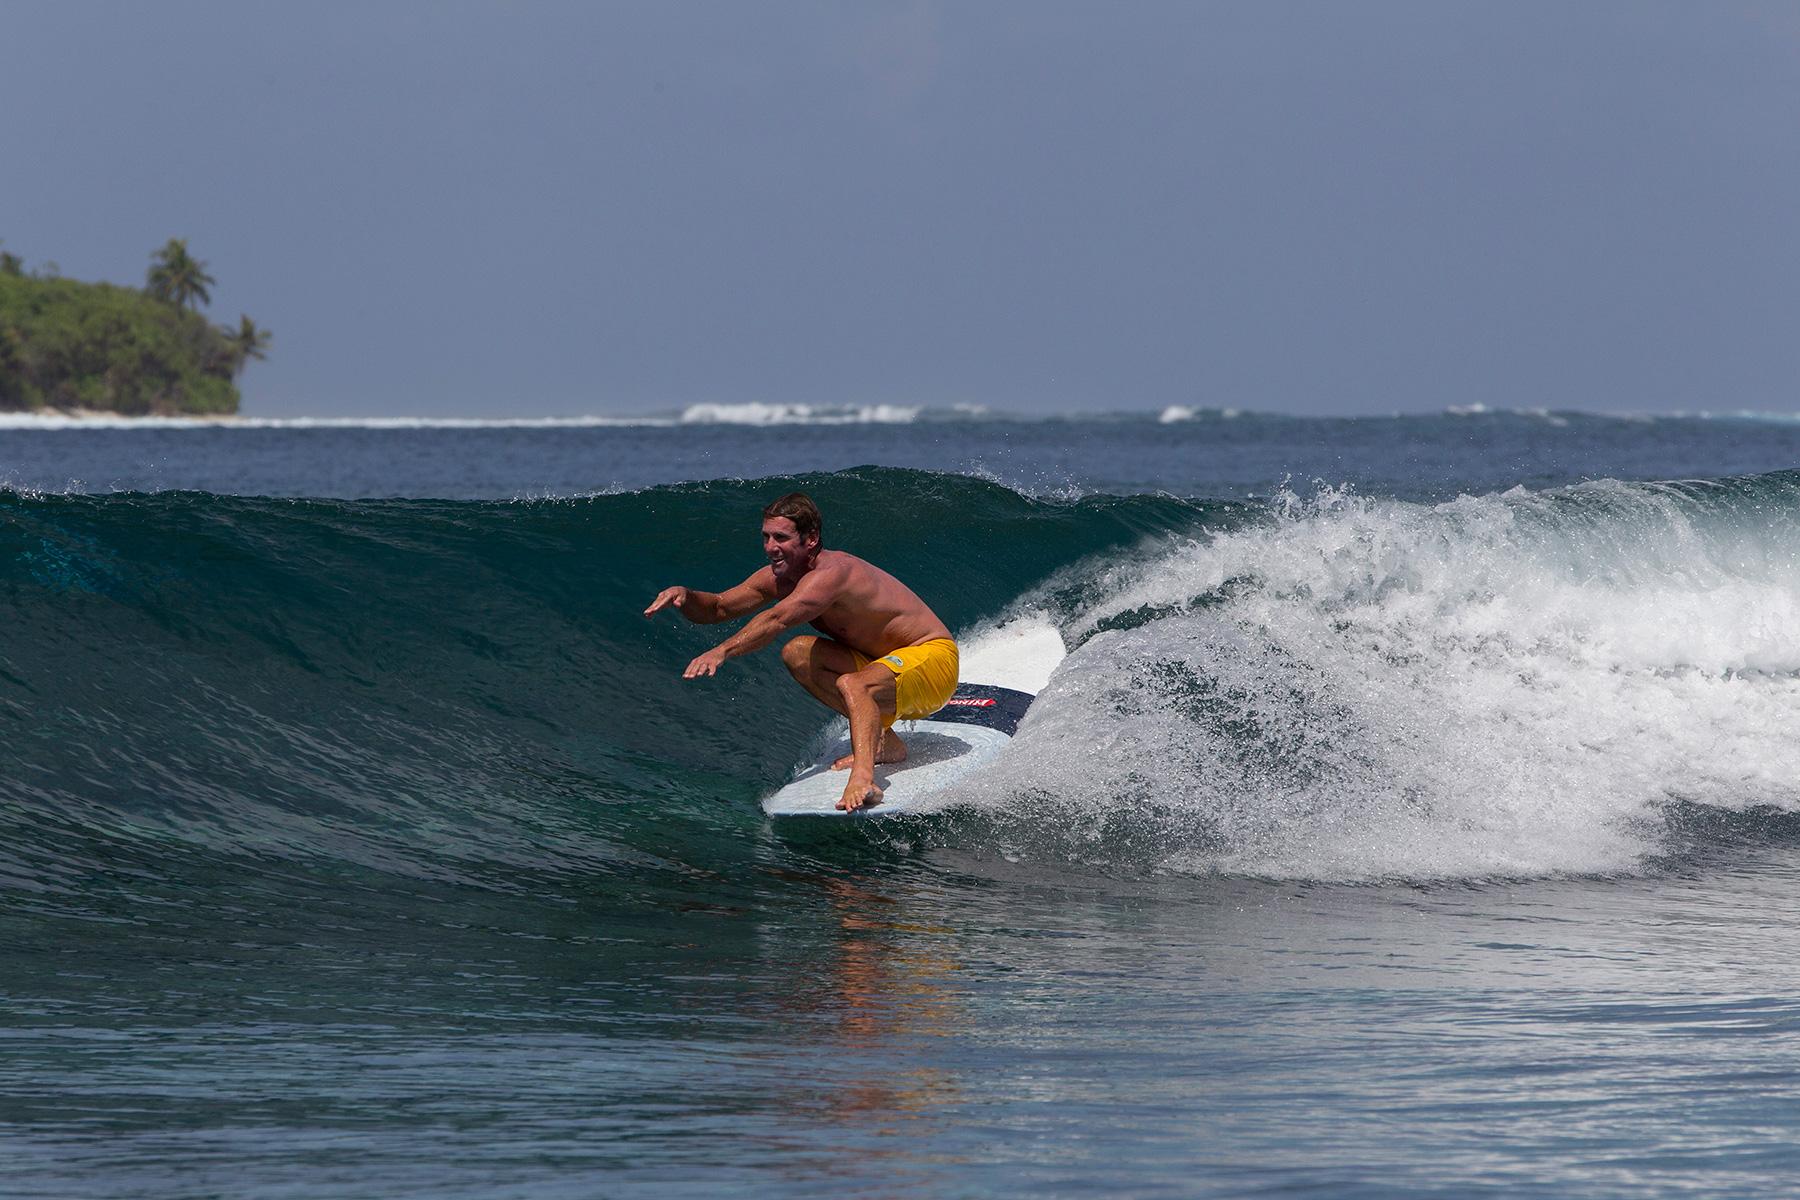 Surf_Simply_Wingnut_Interview_Maldives_Navi_1_fullwidth.jpg